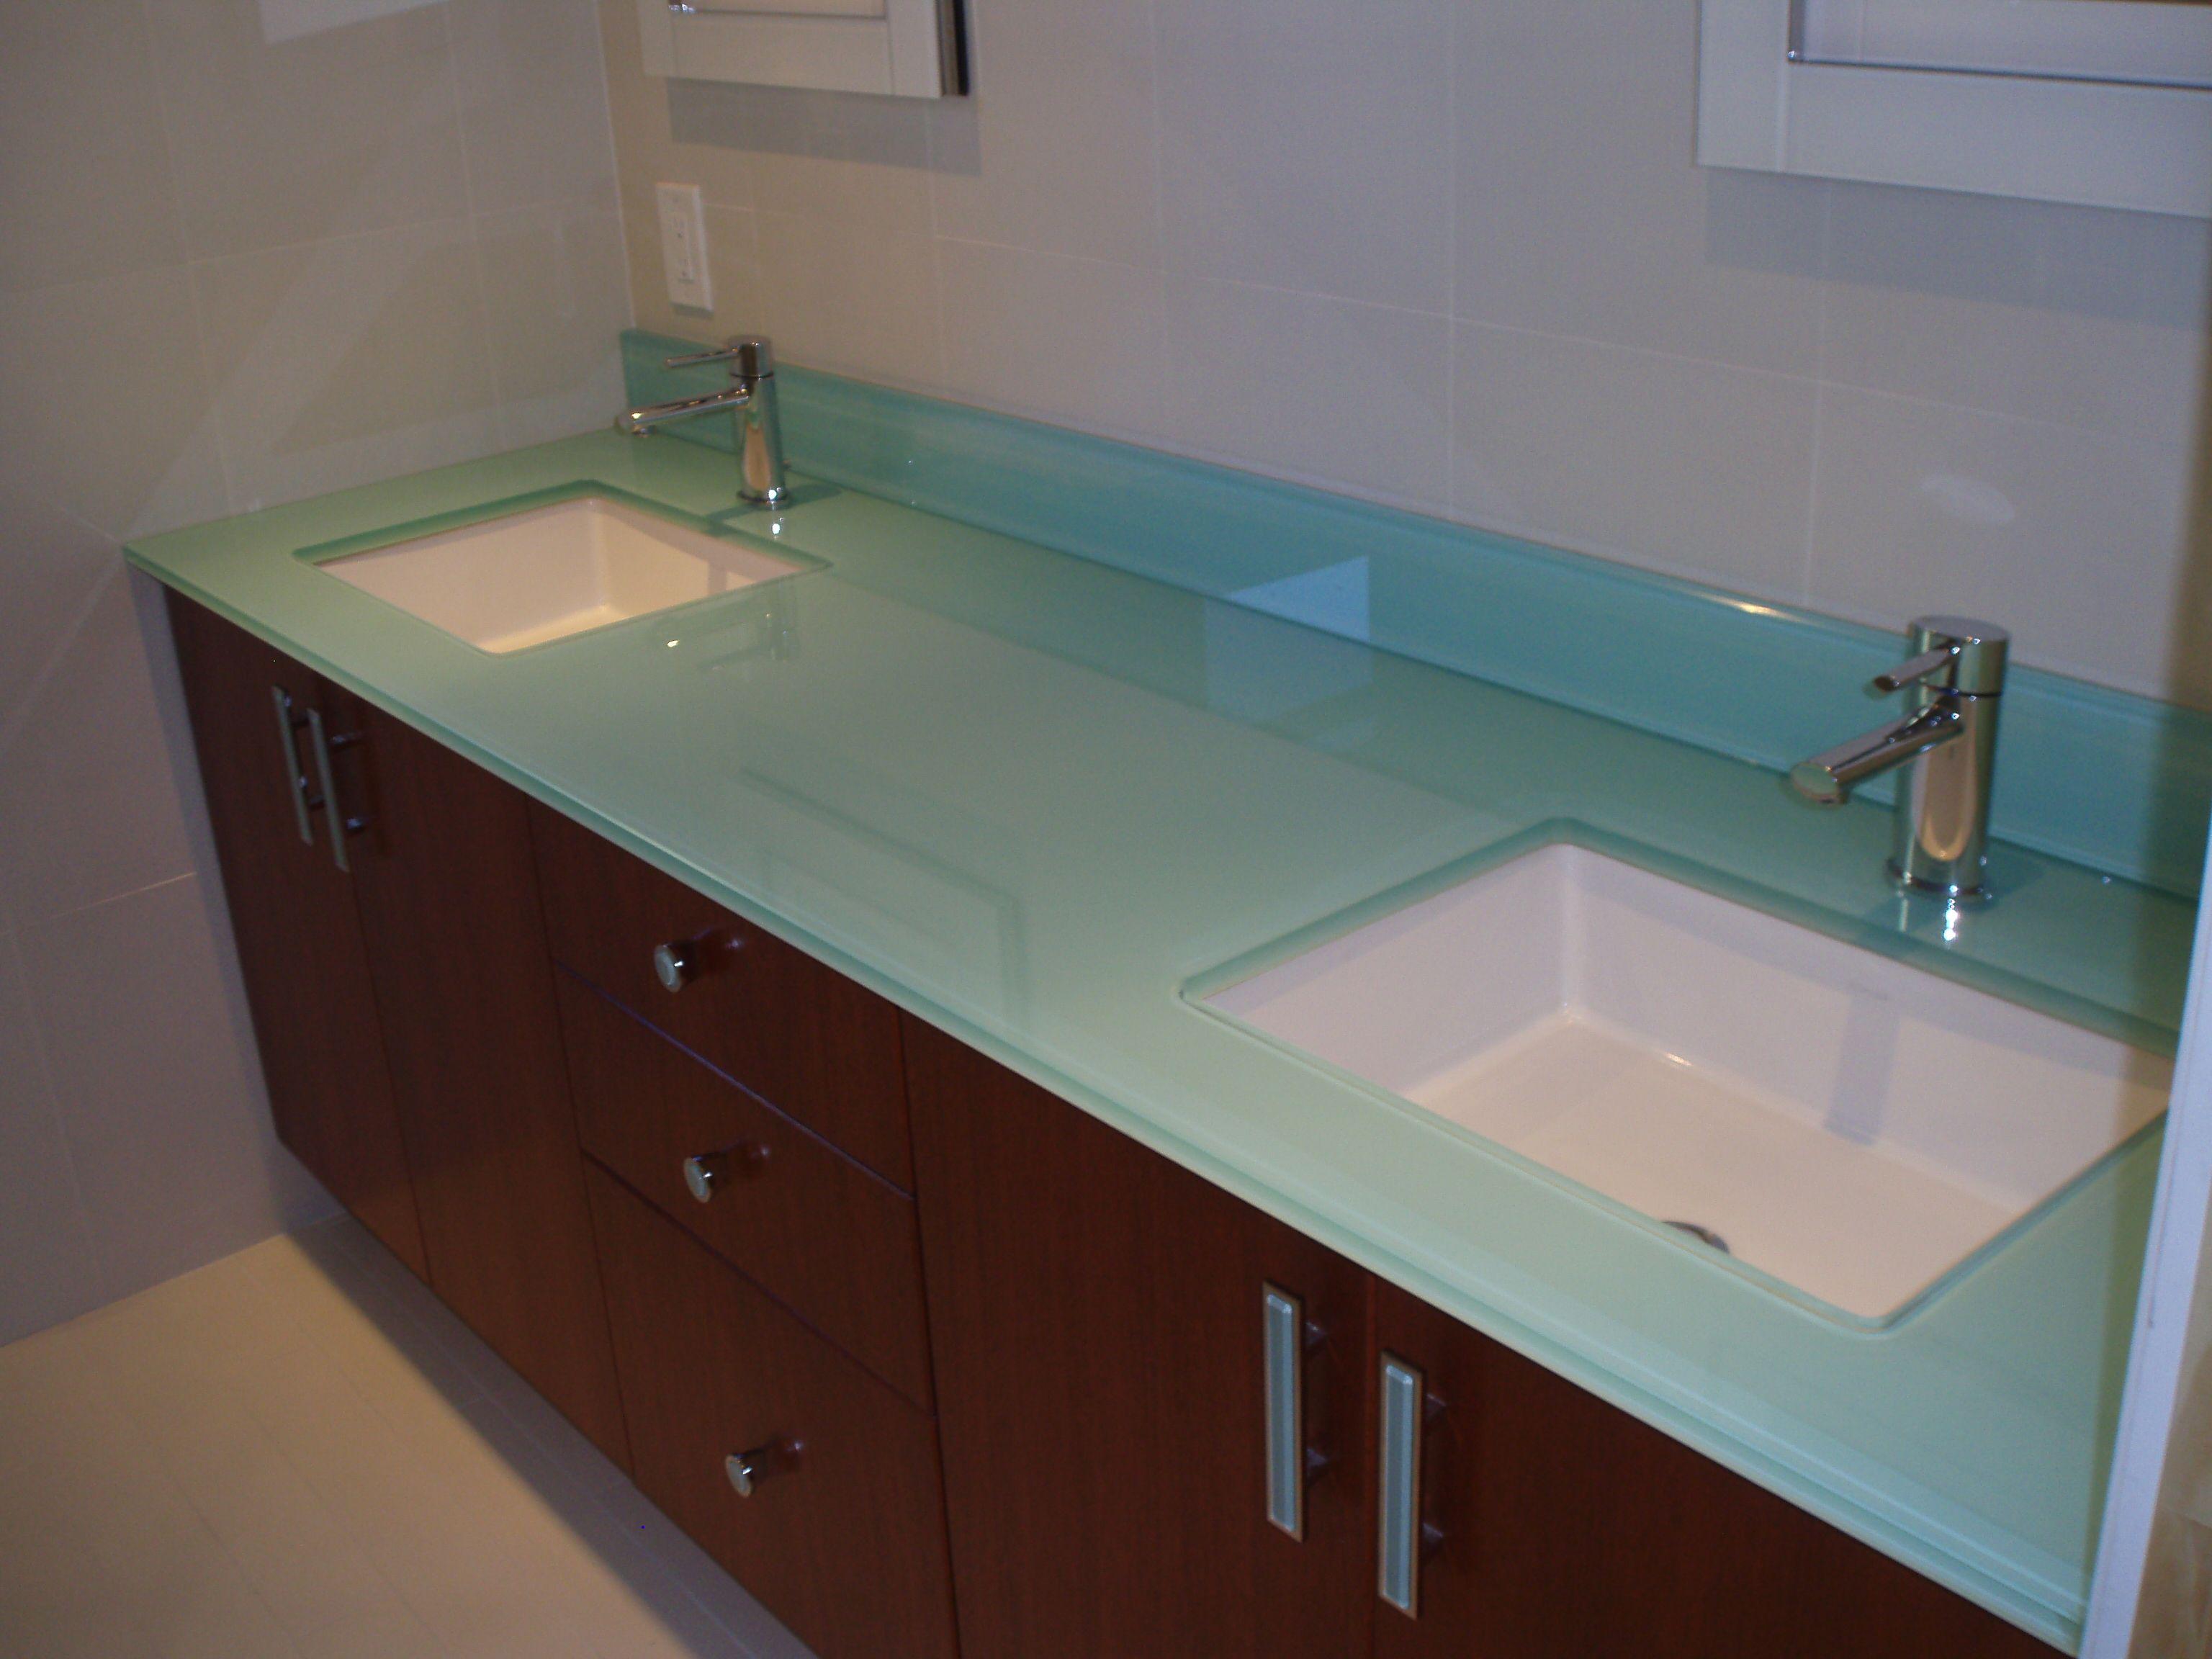 Back Painted Glass Bathroom Countertop With Two White Undermount Sinks.  #undermountsink #nkba